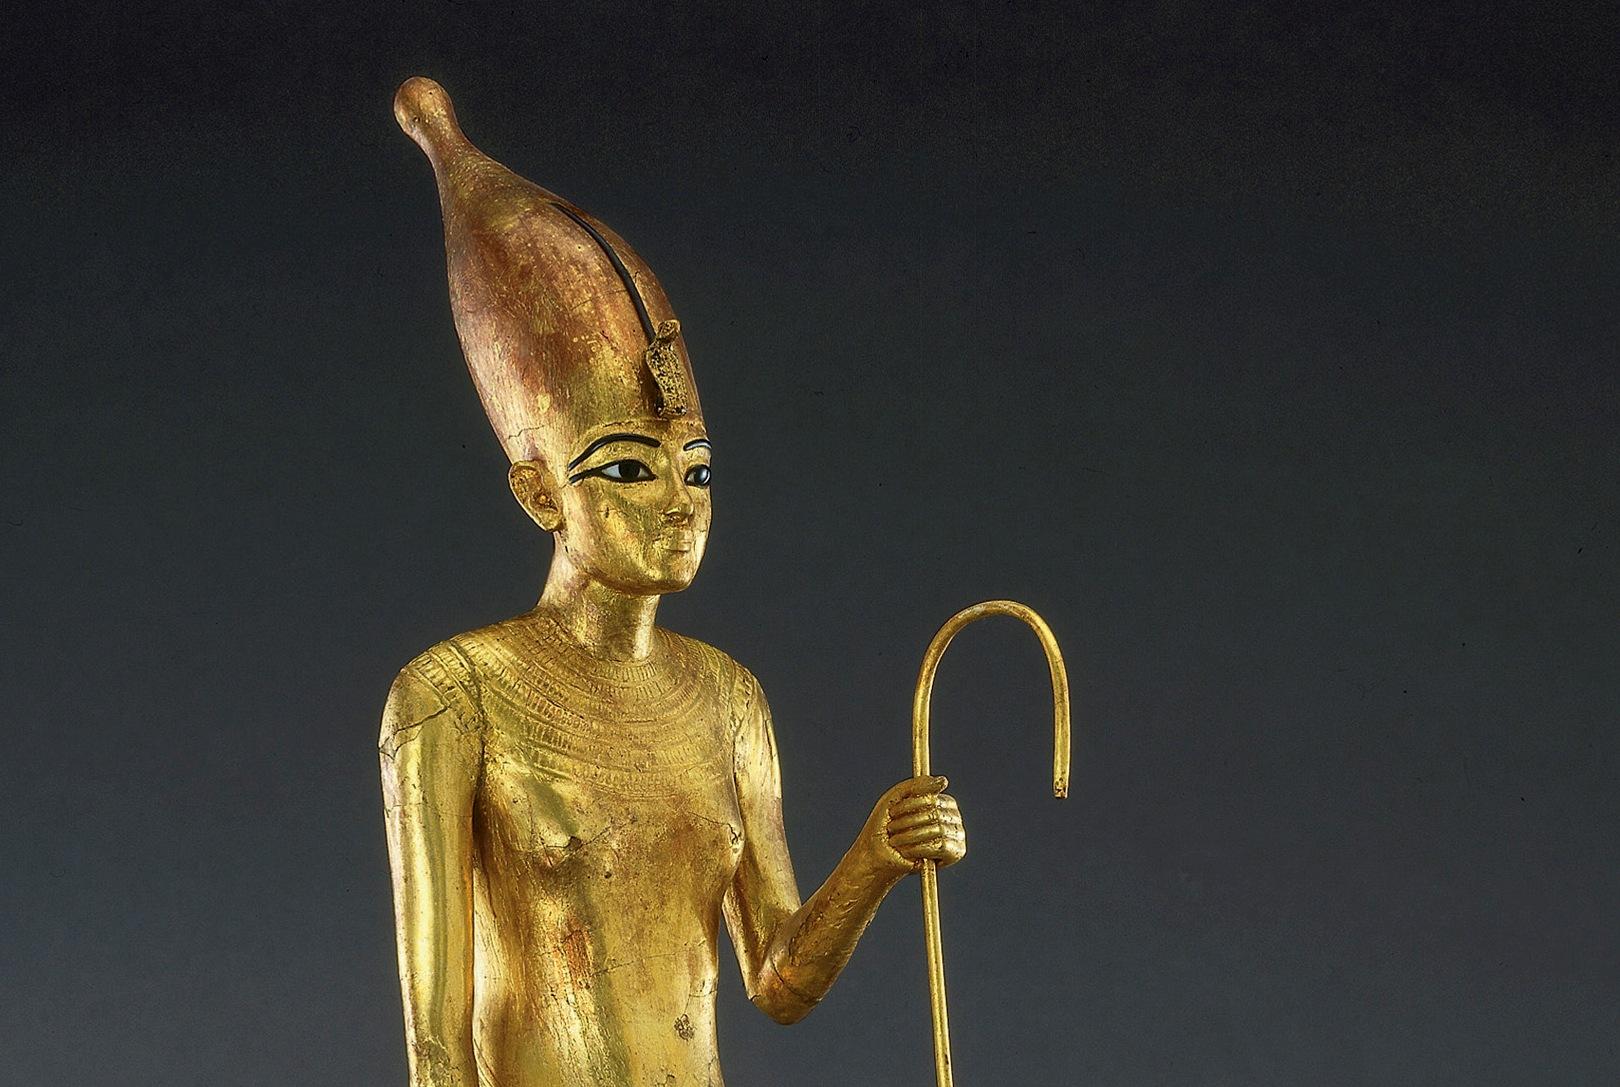 statuette_upper_egypt 1B.png